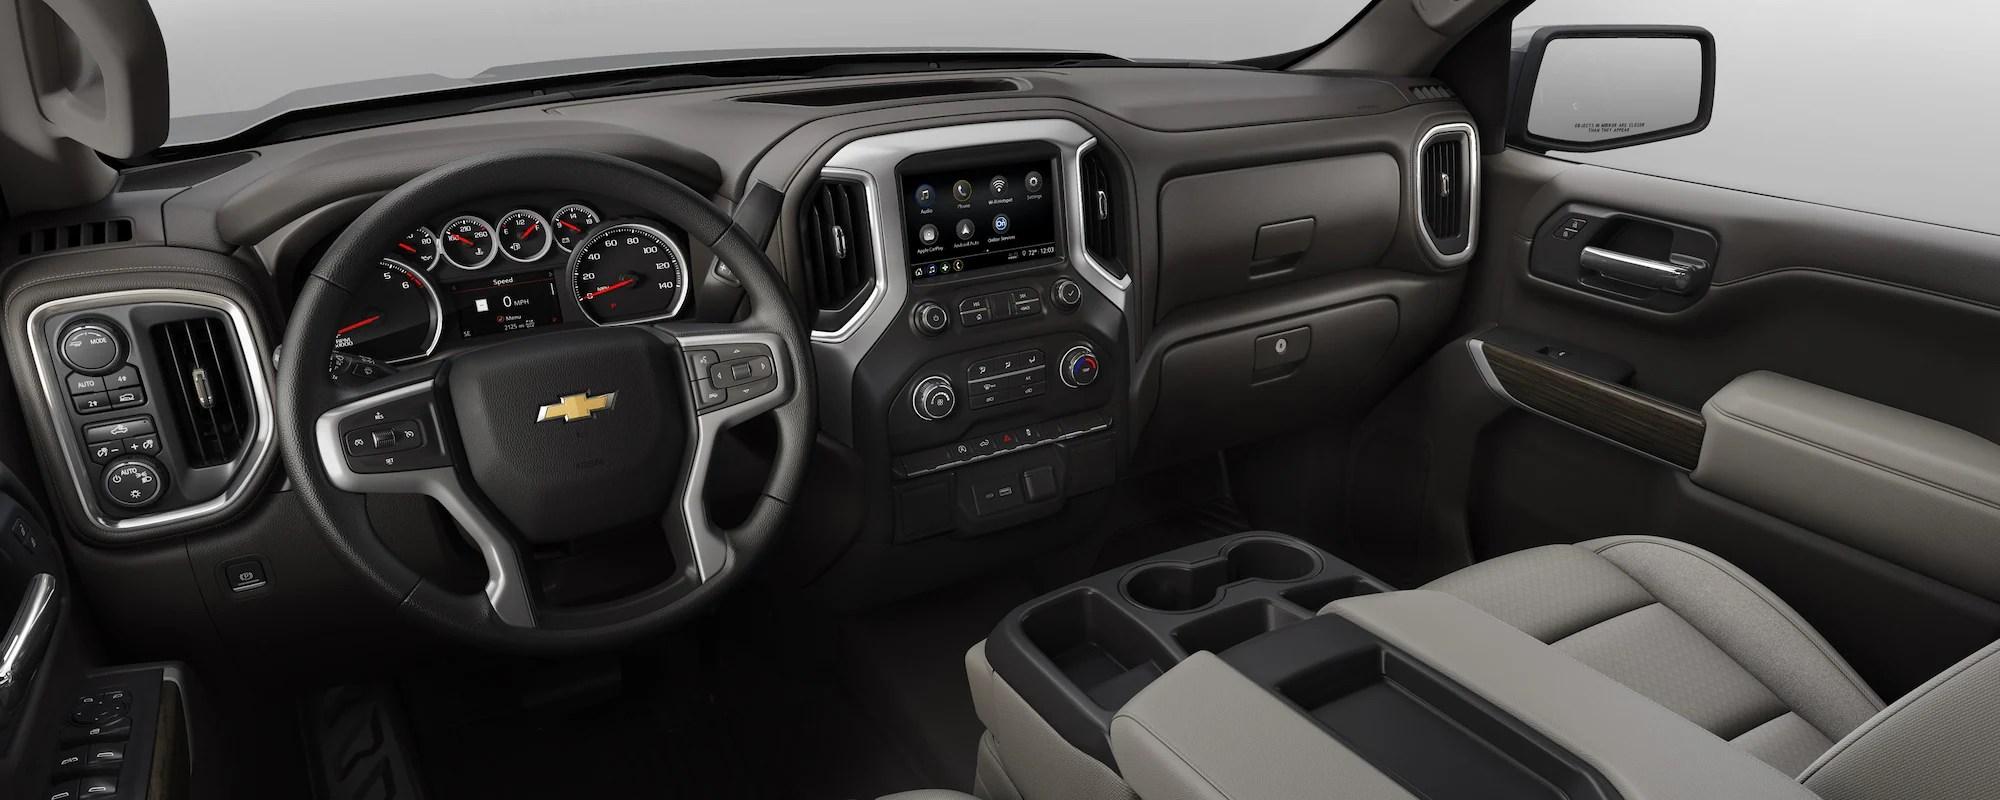 2020 Chevrolet Silverado 1500 Full Size Pickup Truck Gm